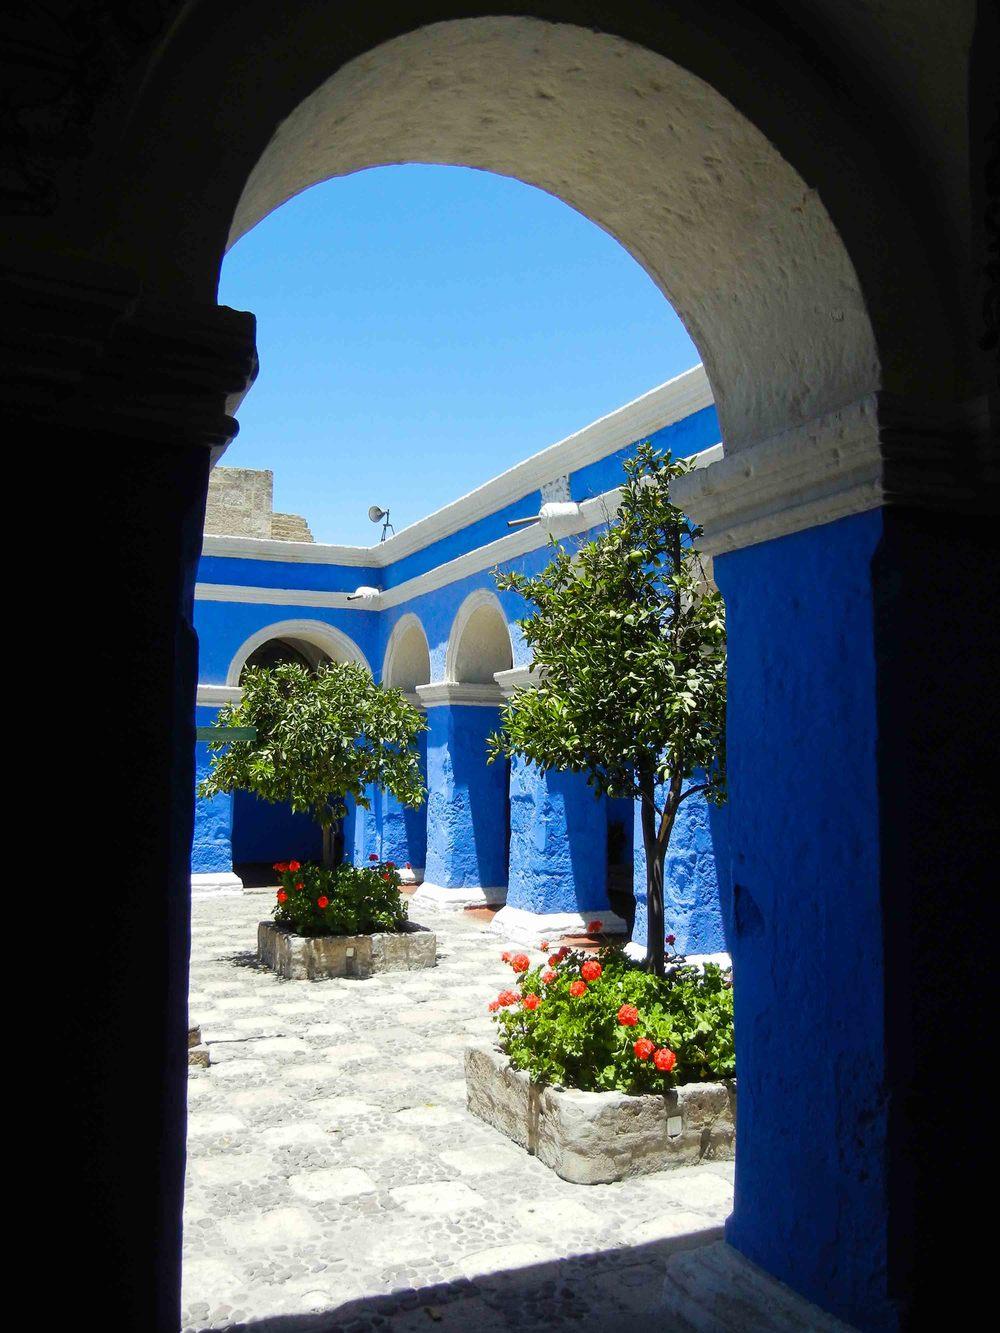 2015_11_S_ArequipaColca-31.jpg